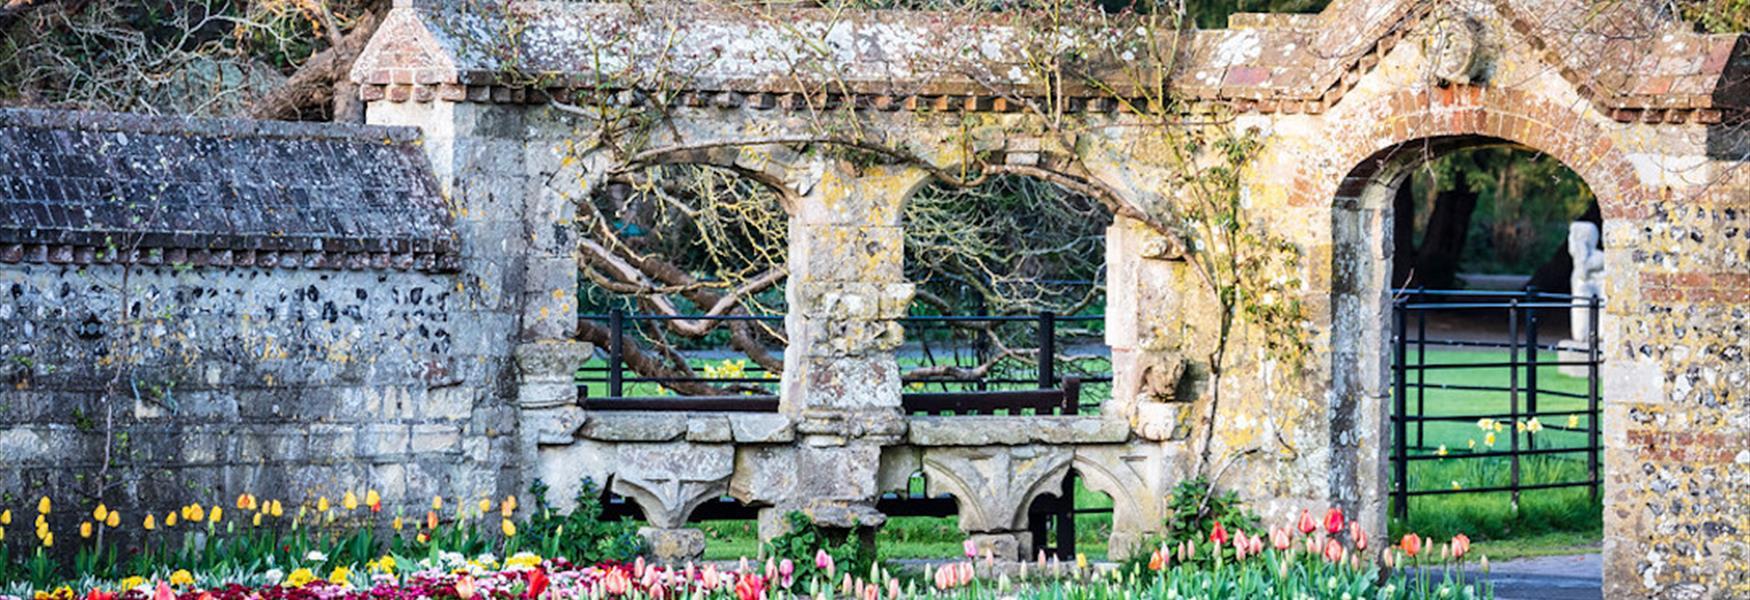 Southover Grange in Spring - Nigel French